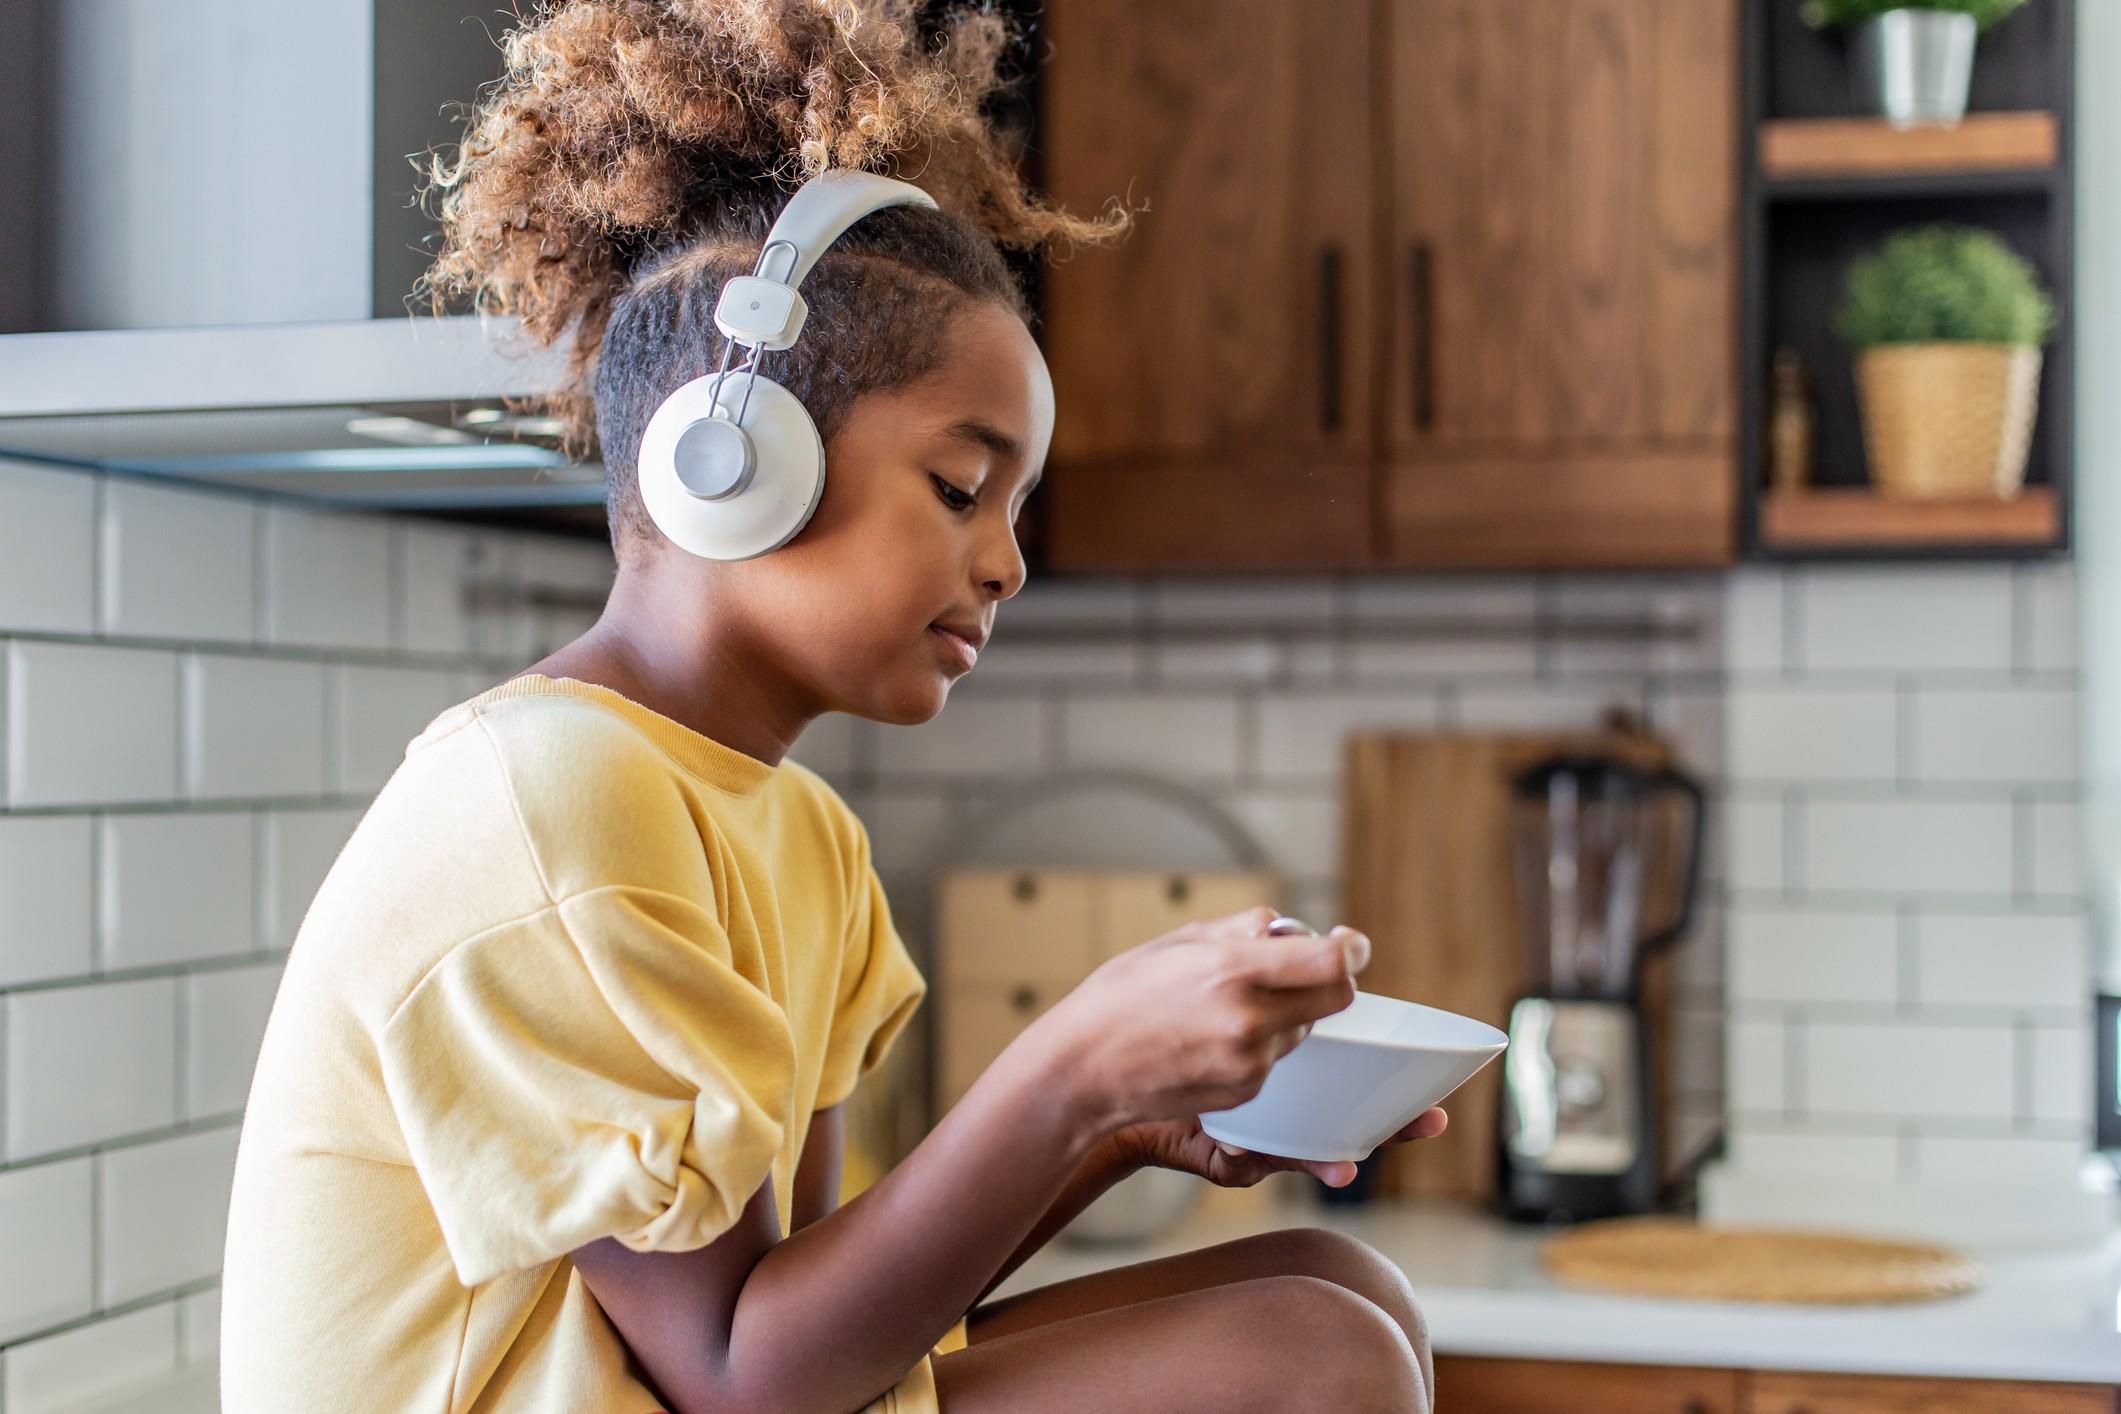 Young girl wearing headphones in her kitchen.